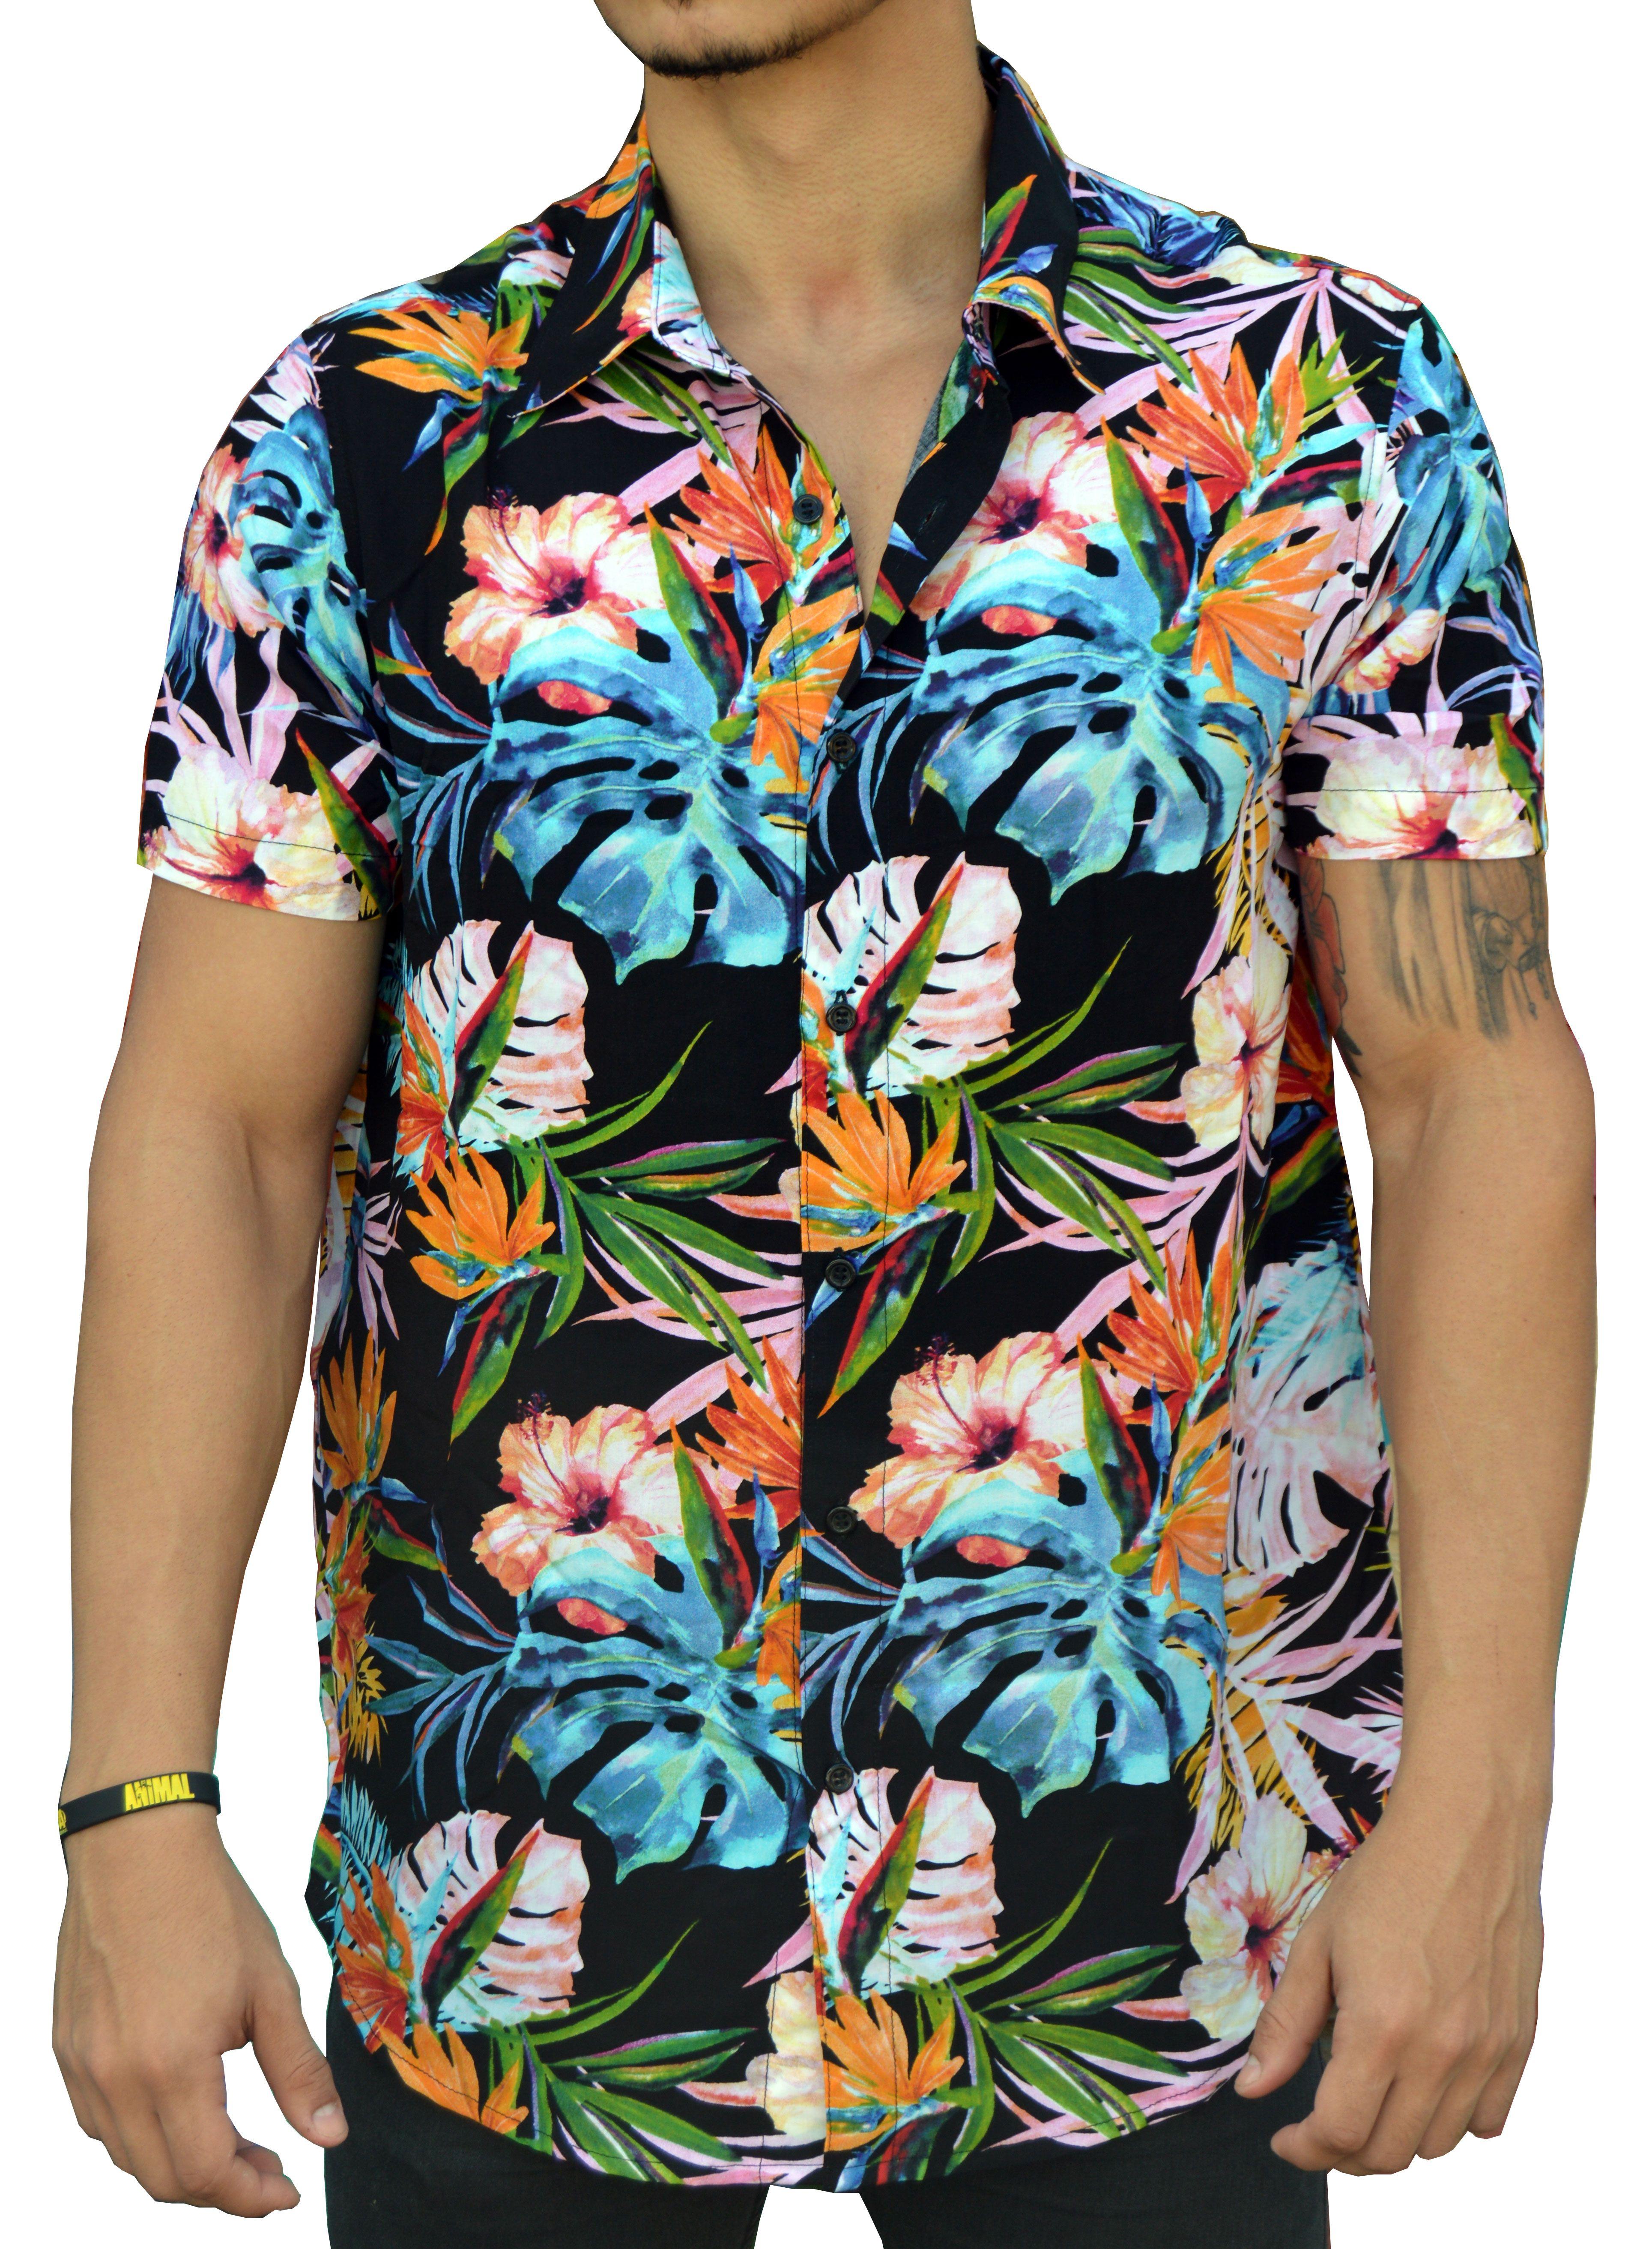 71c9d17a4 Camisa Floral Masculina Costela de Adão Azul | Camisas Masculinas ...